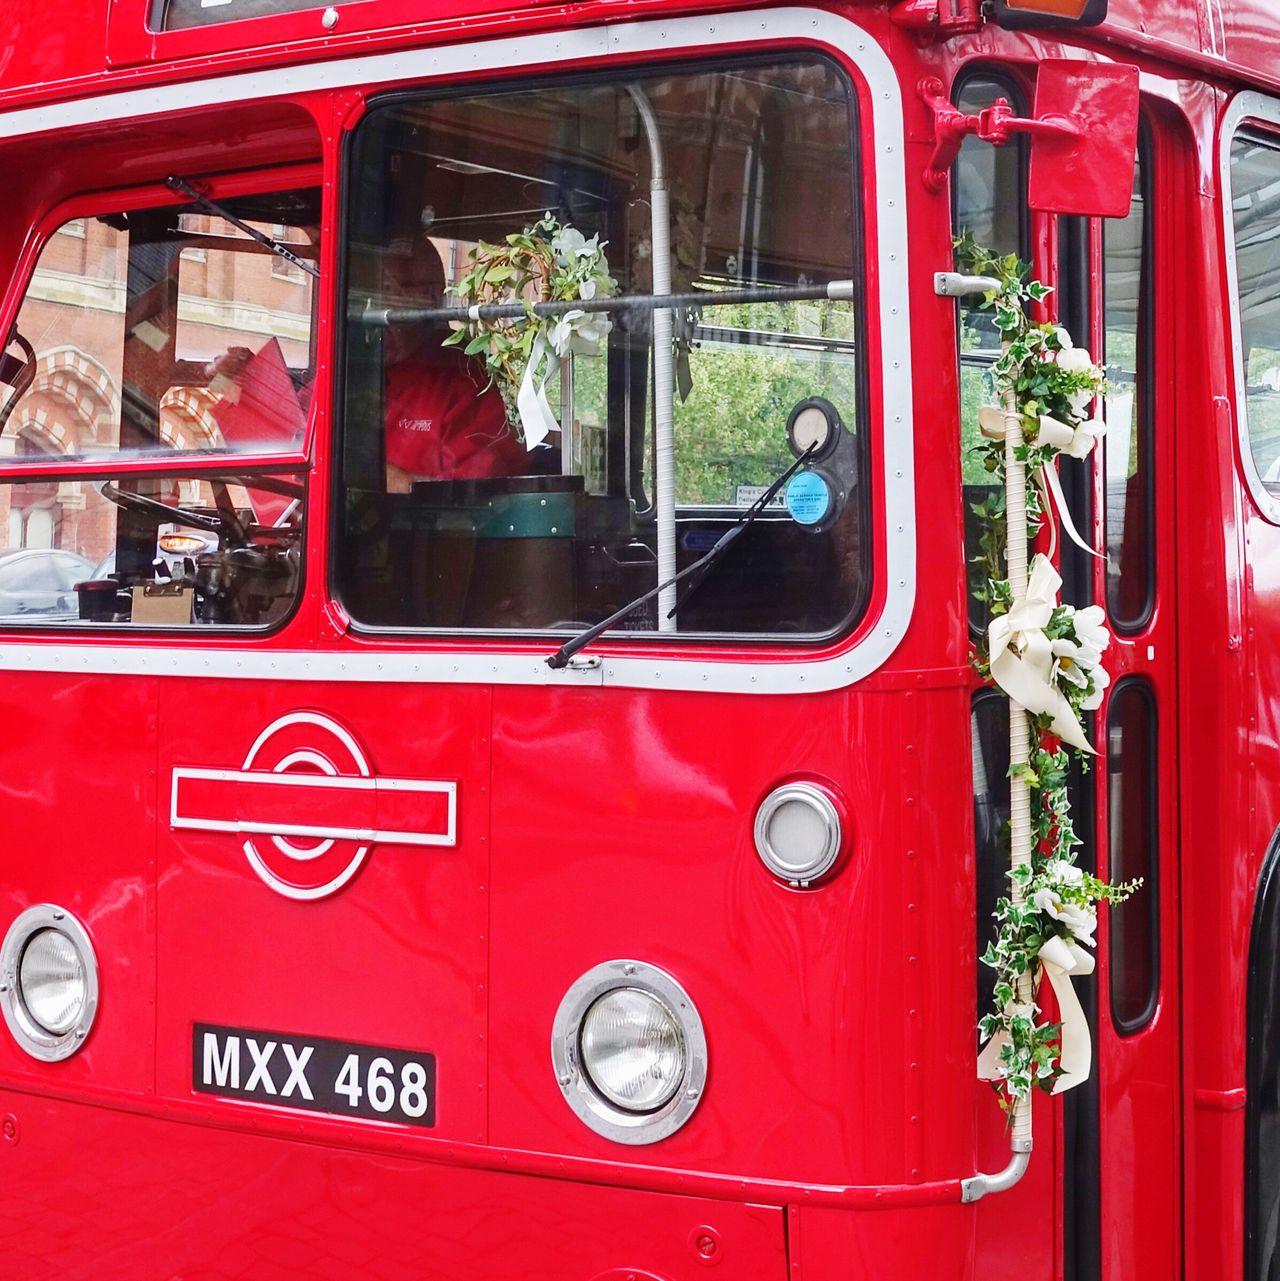 London Mode Of Transport Red Land Vehicle Transportation Windshield London Lifestyle London Bus Vintage Bus Vintage London Bus